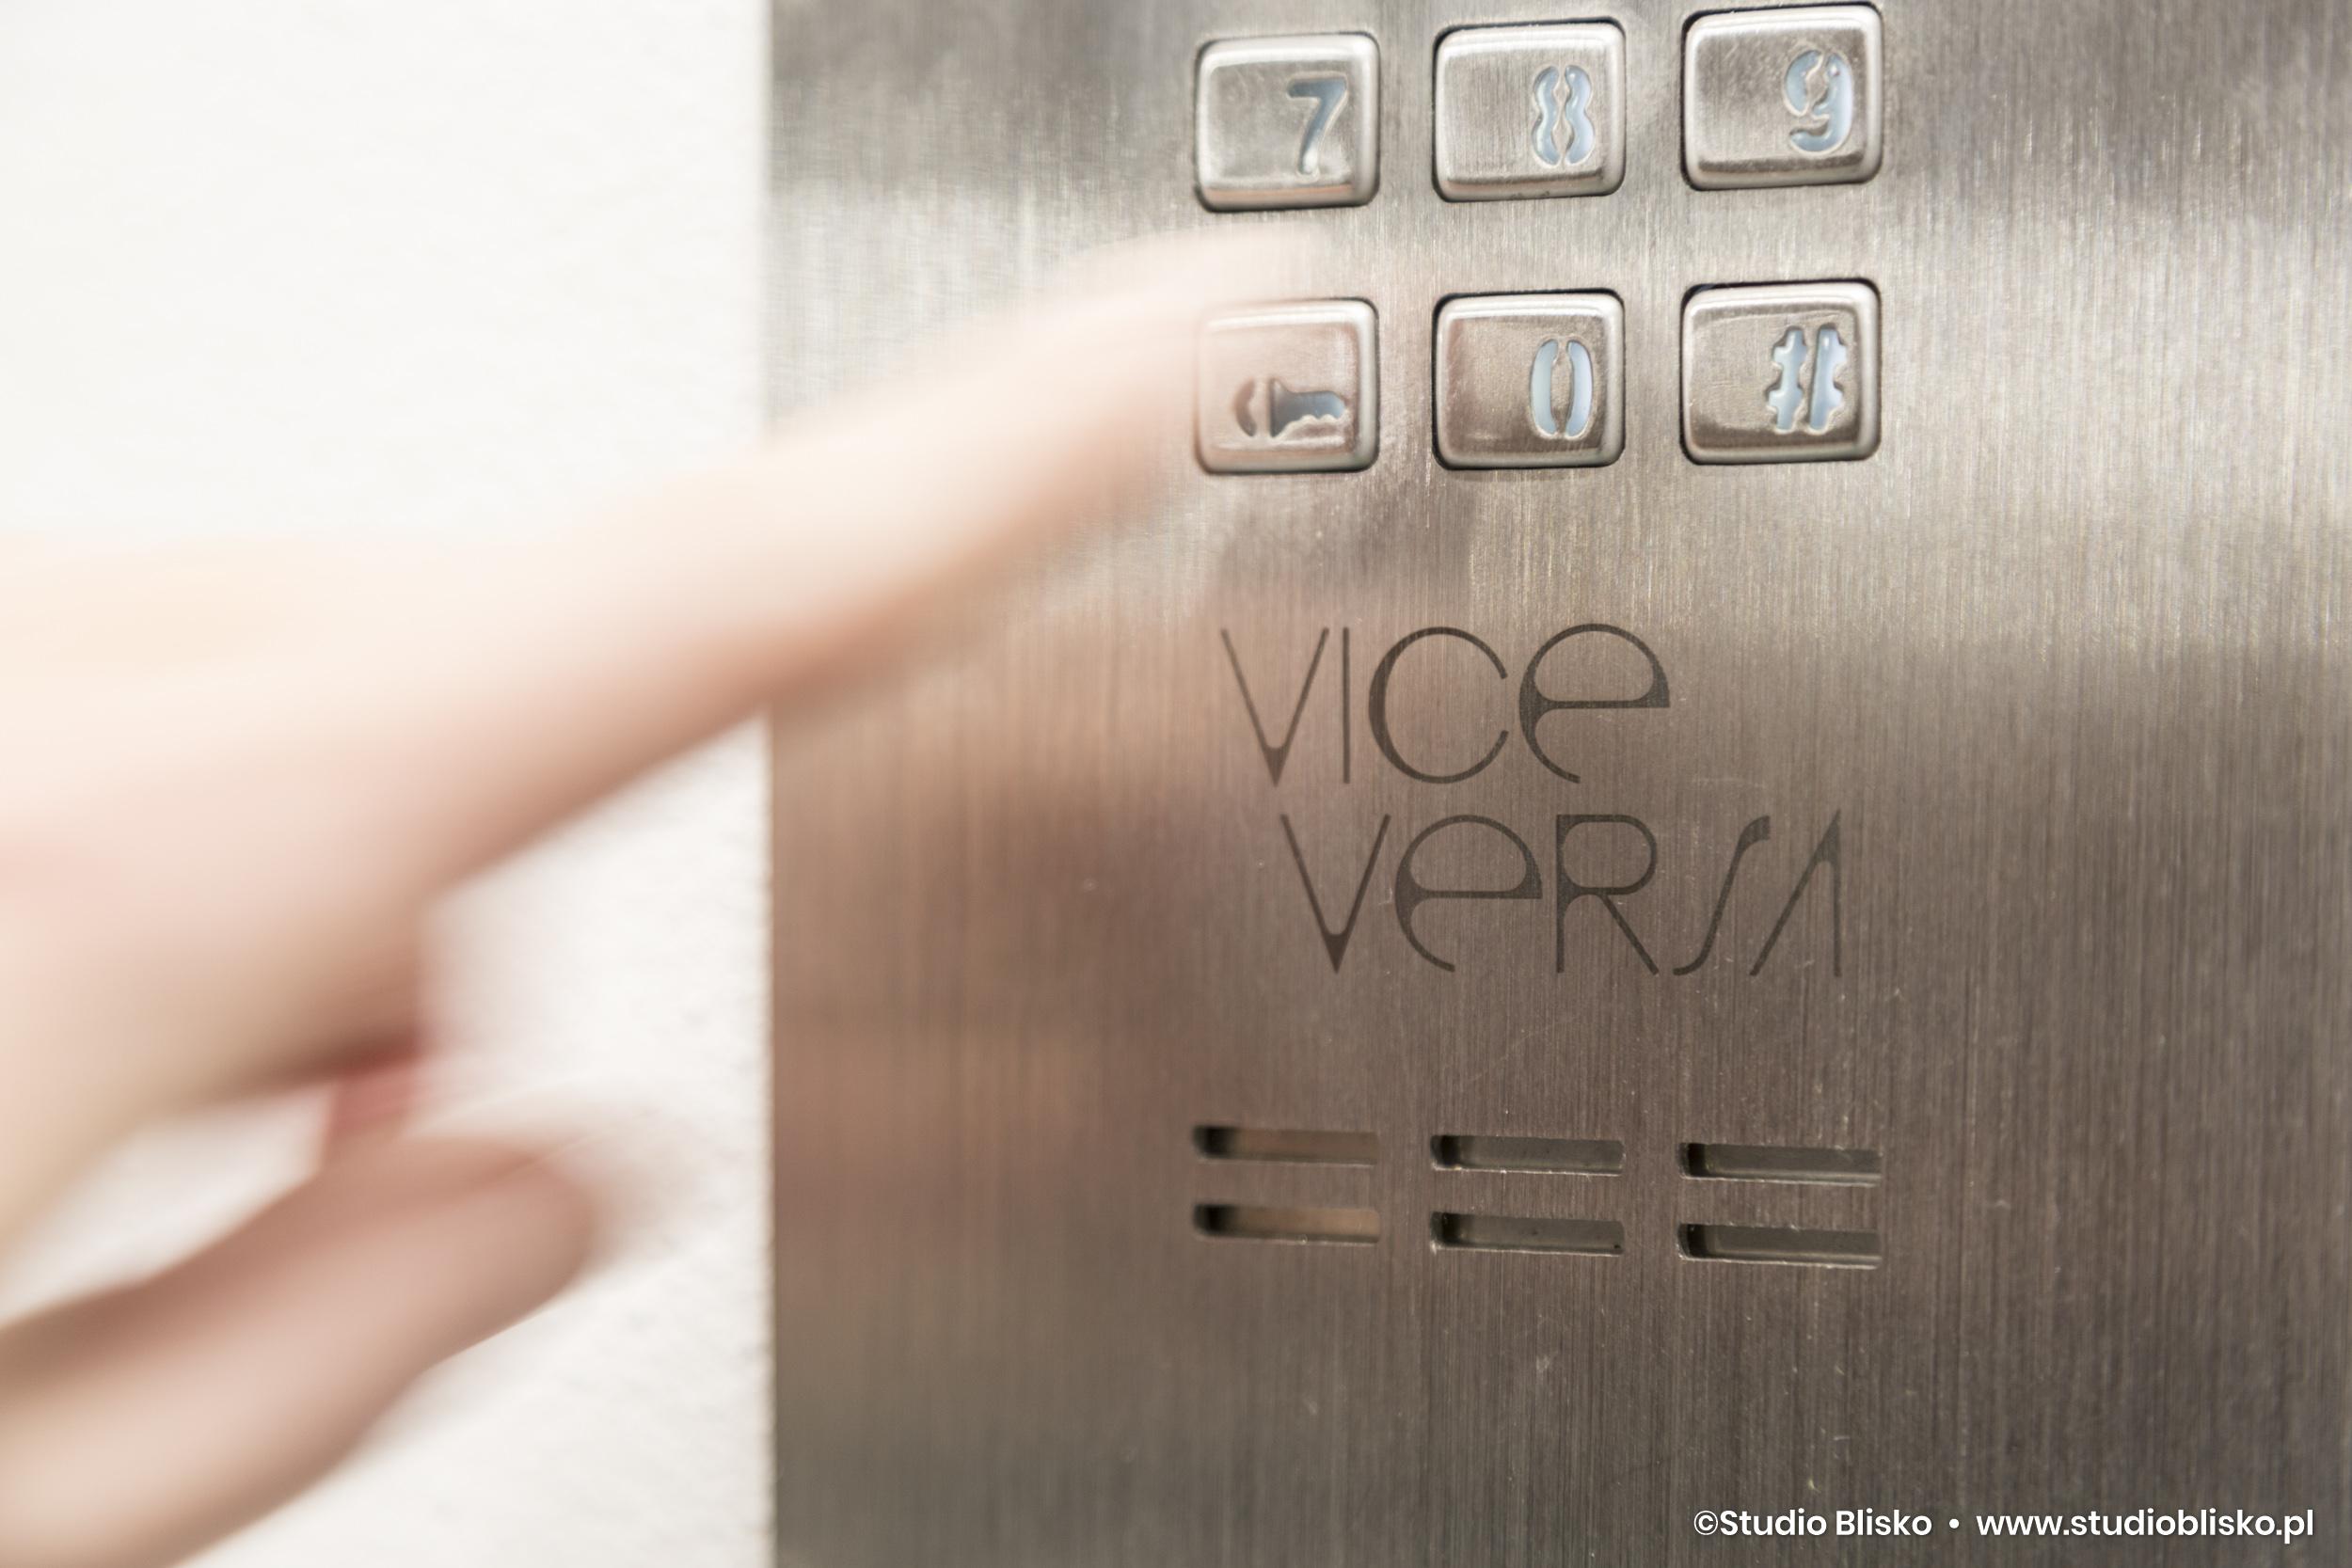 BLISKO_vice-versa (27)